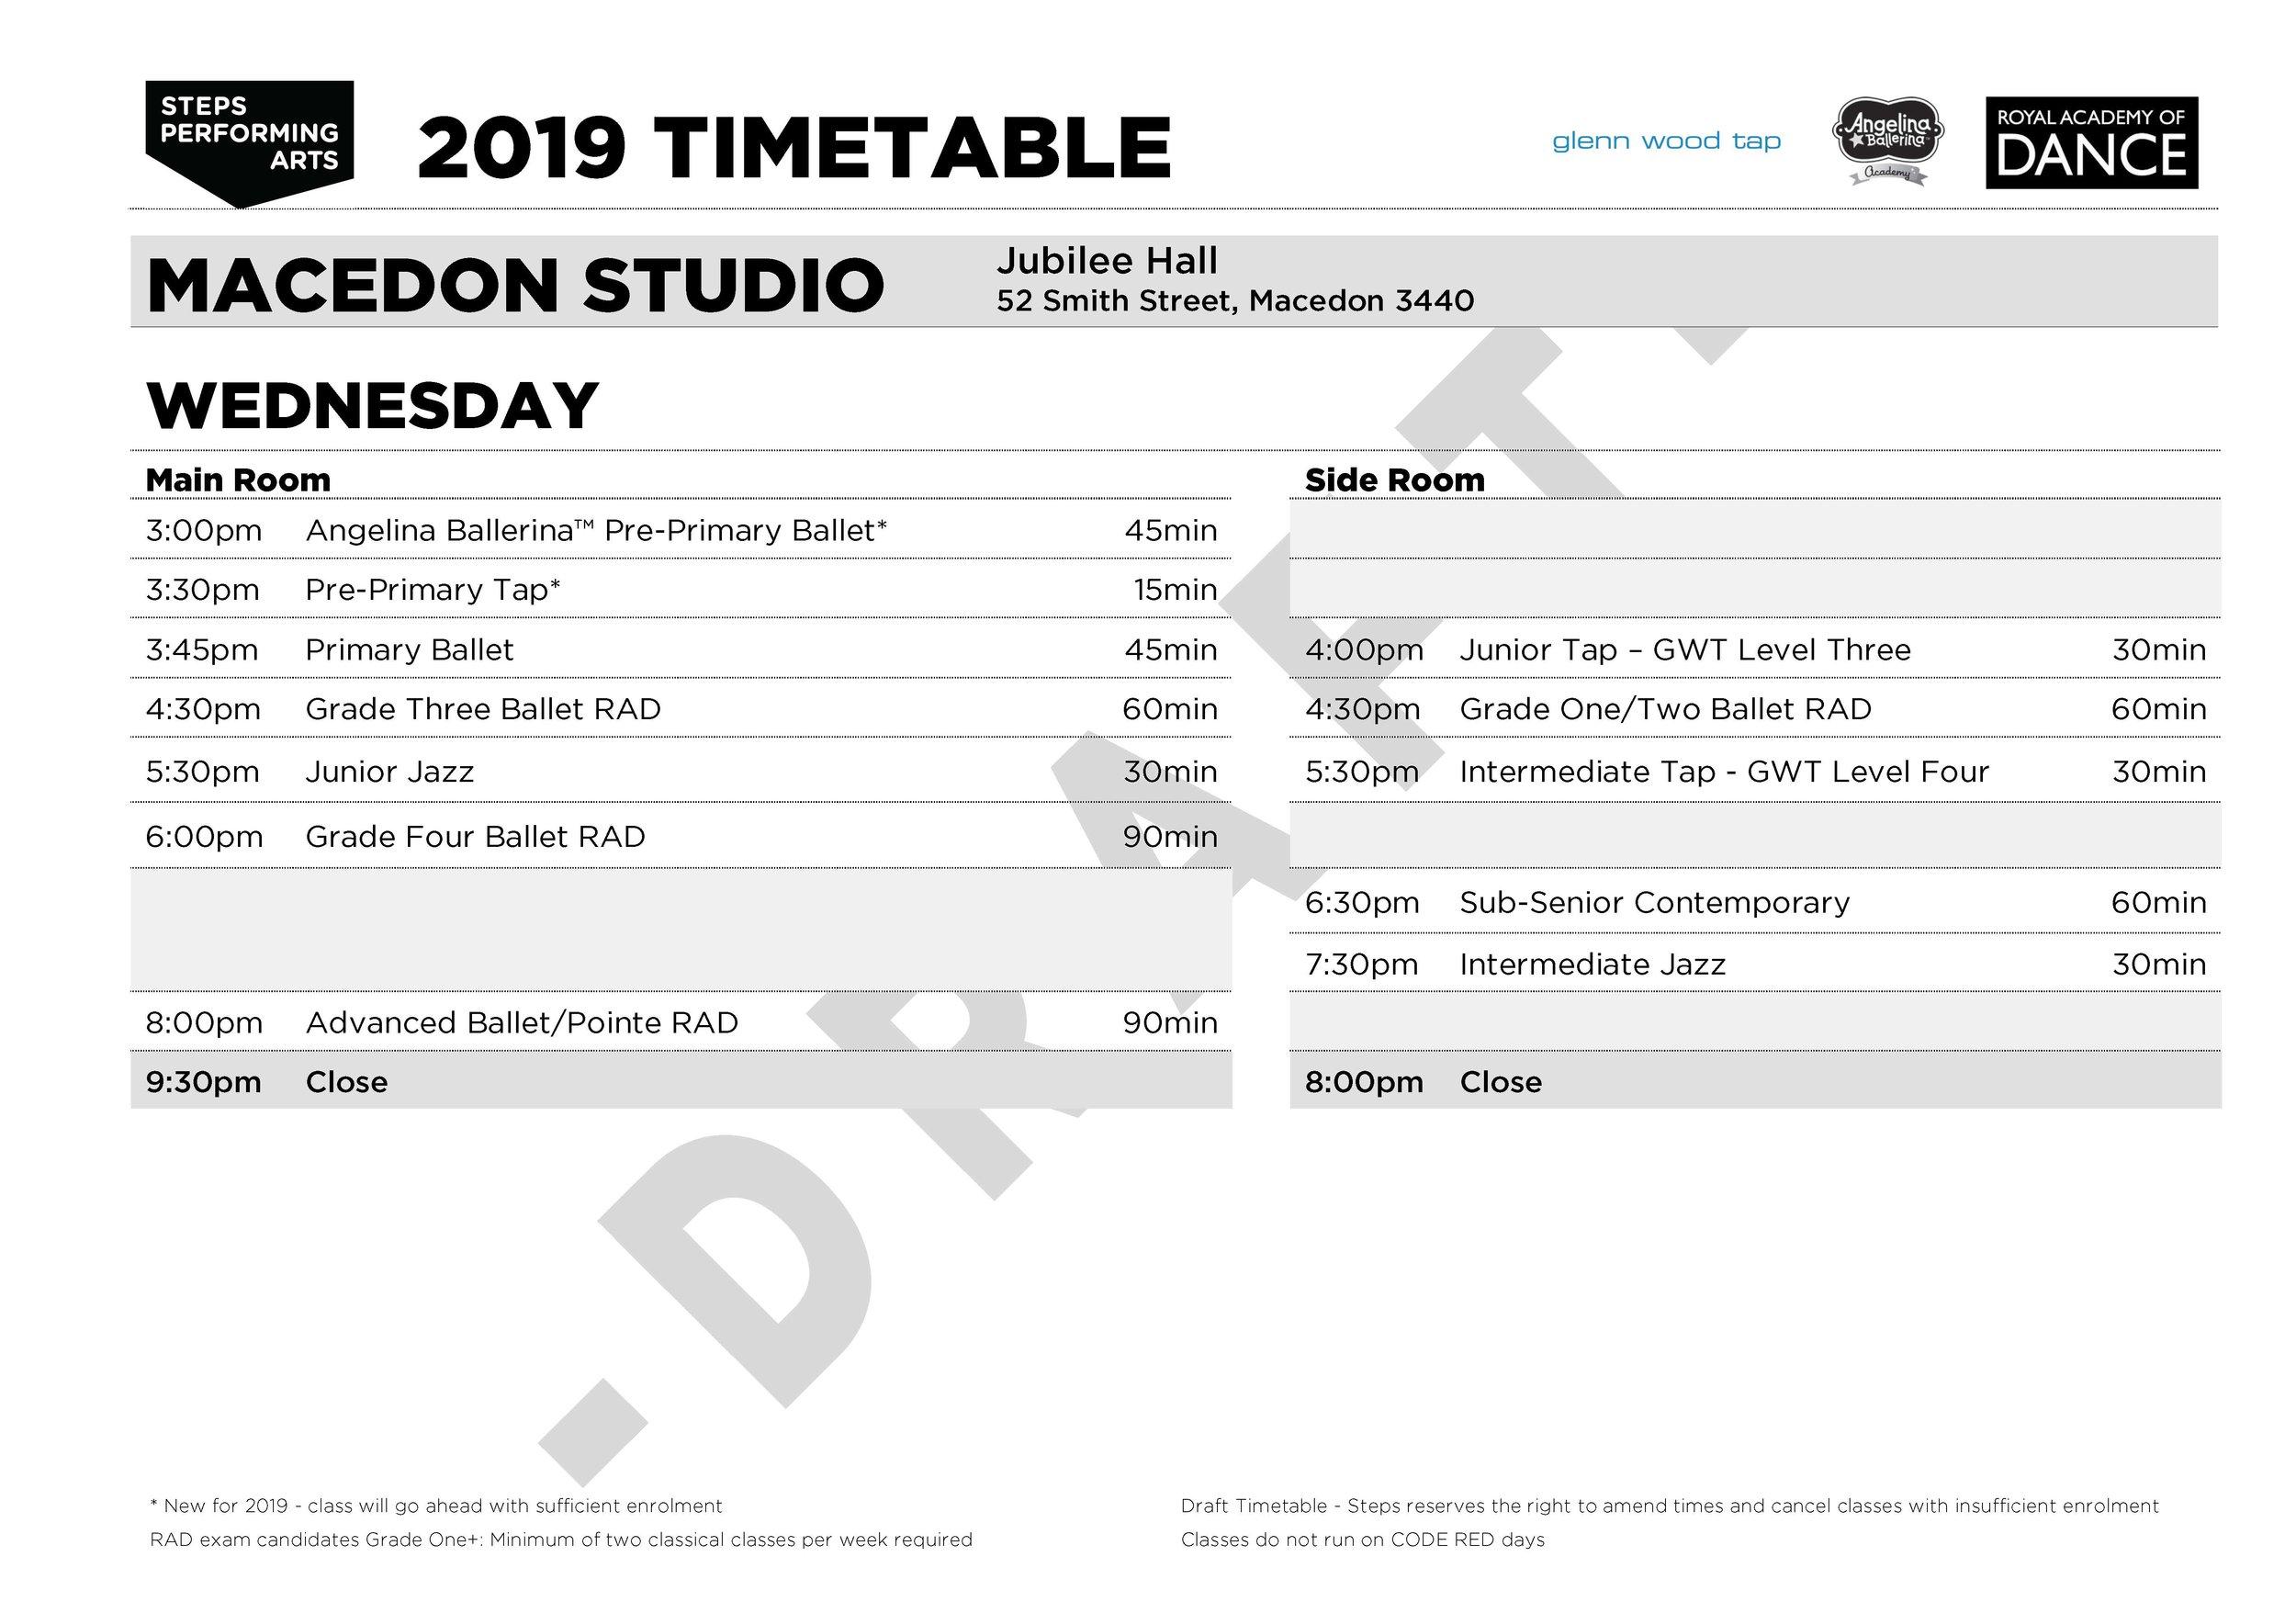 Steps_Timetable_2019_MACEDON.RANGES_Draft2.2_Page_03.jpg